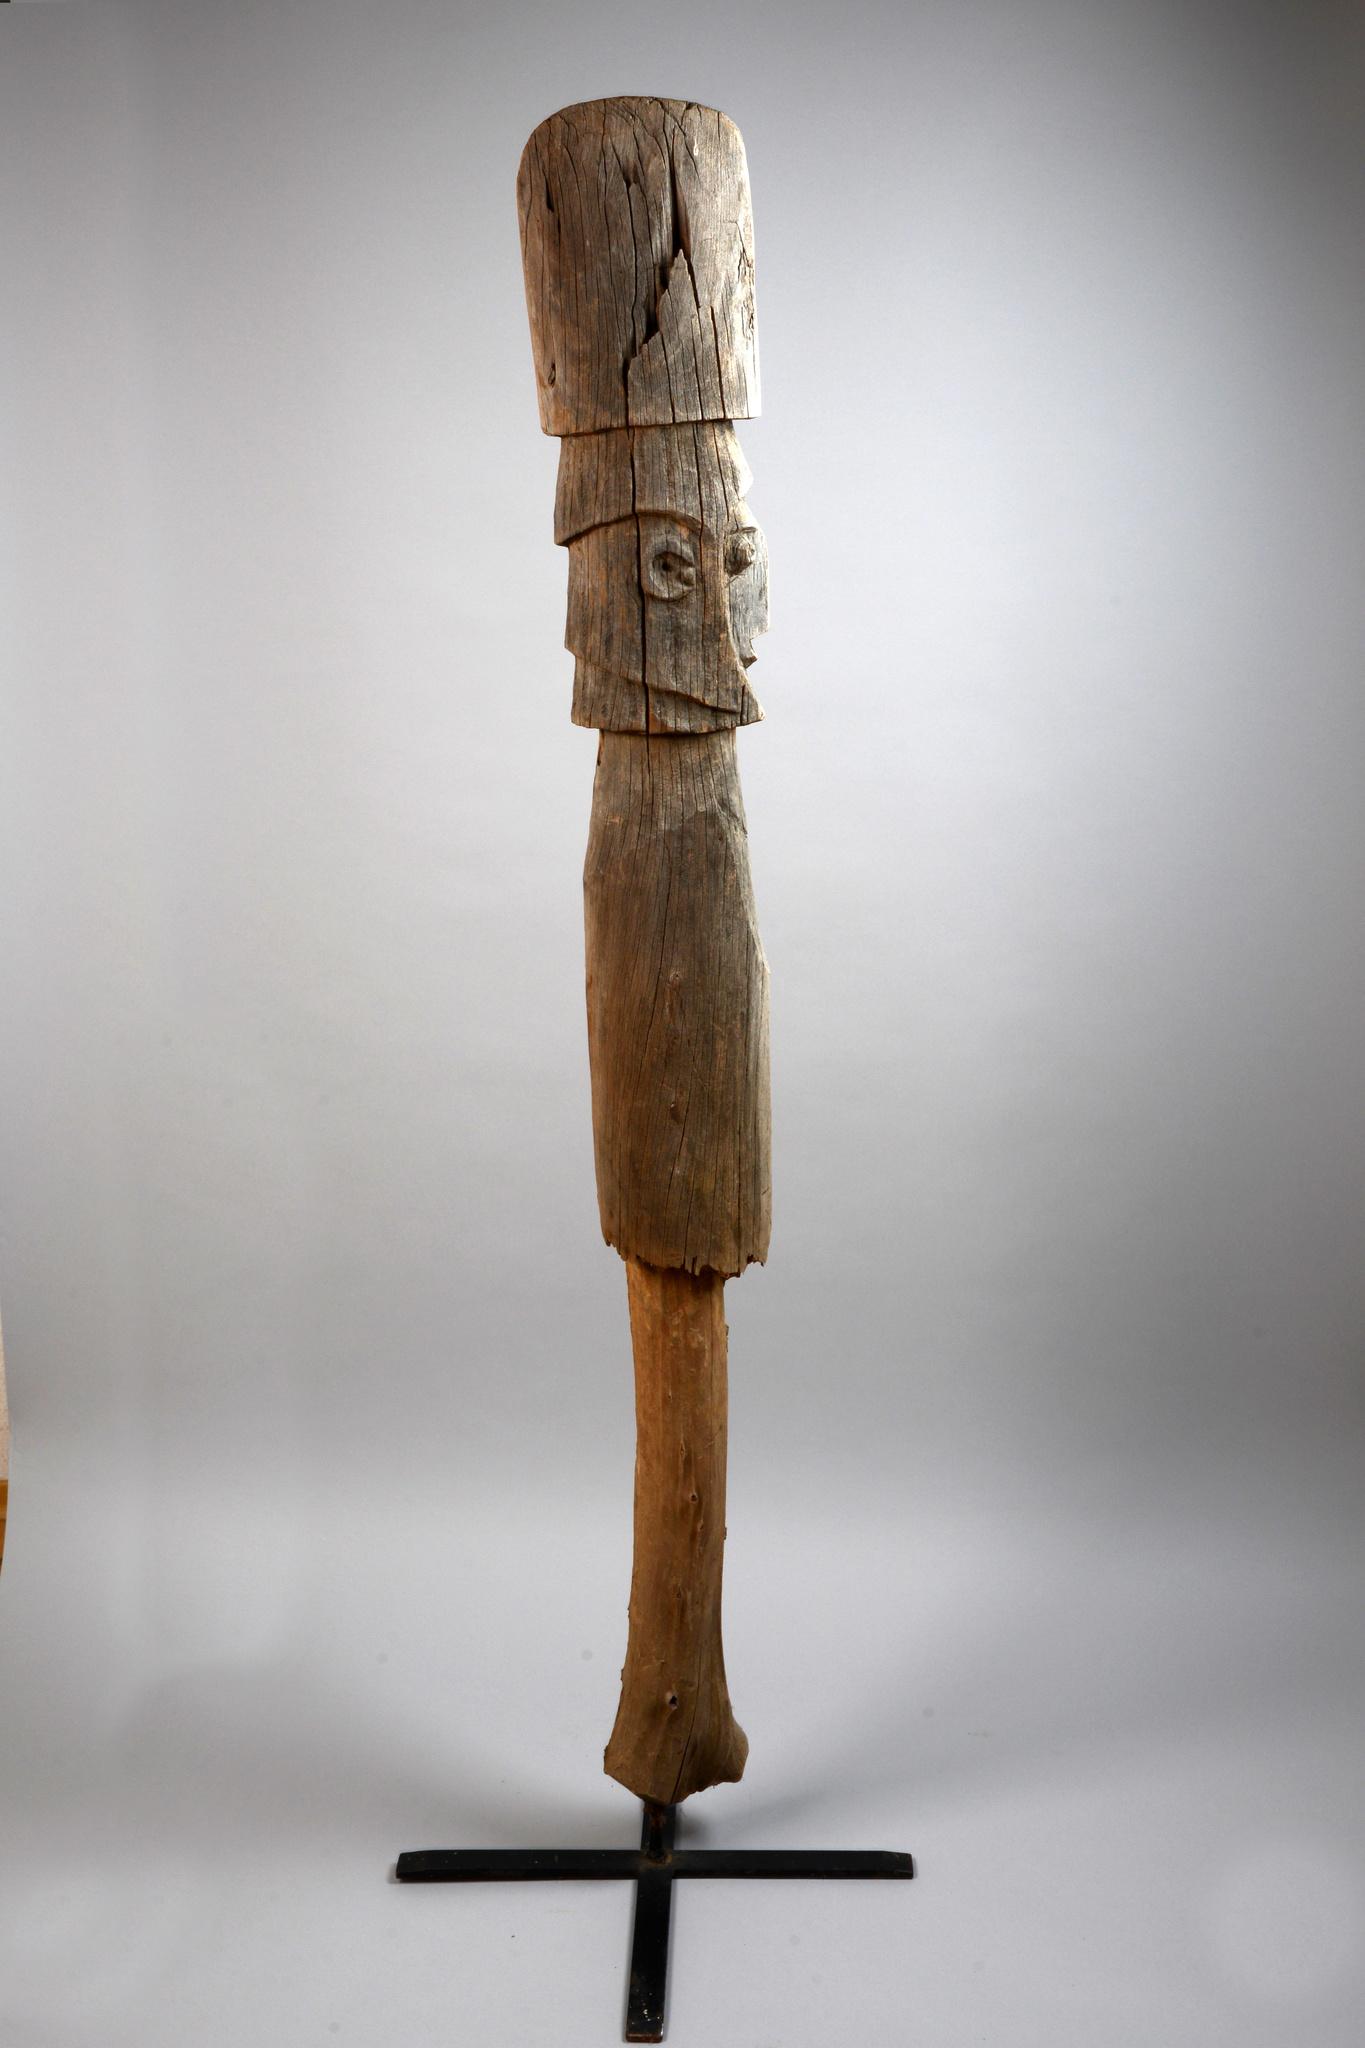 Pfahlförmige Gedenkskulptur